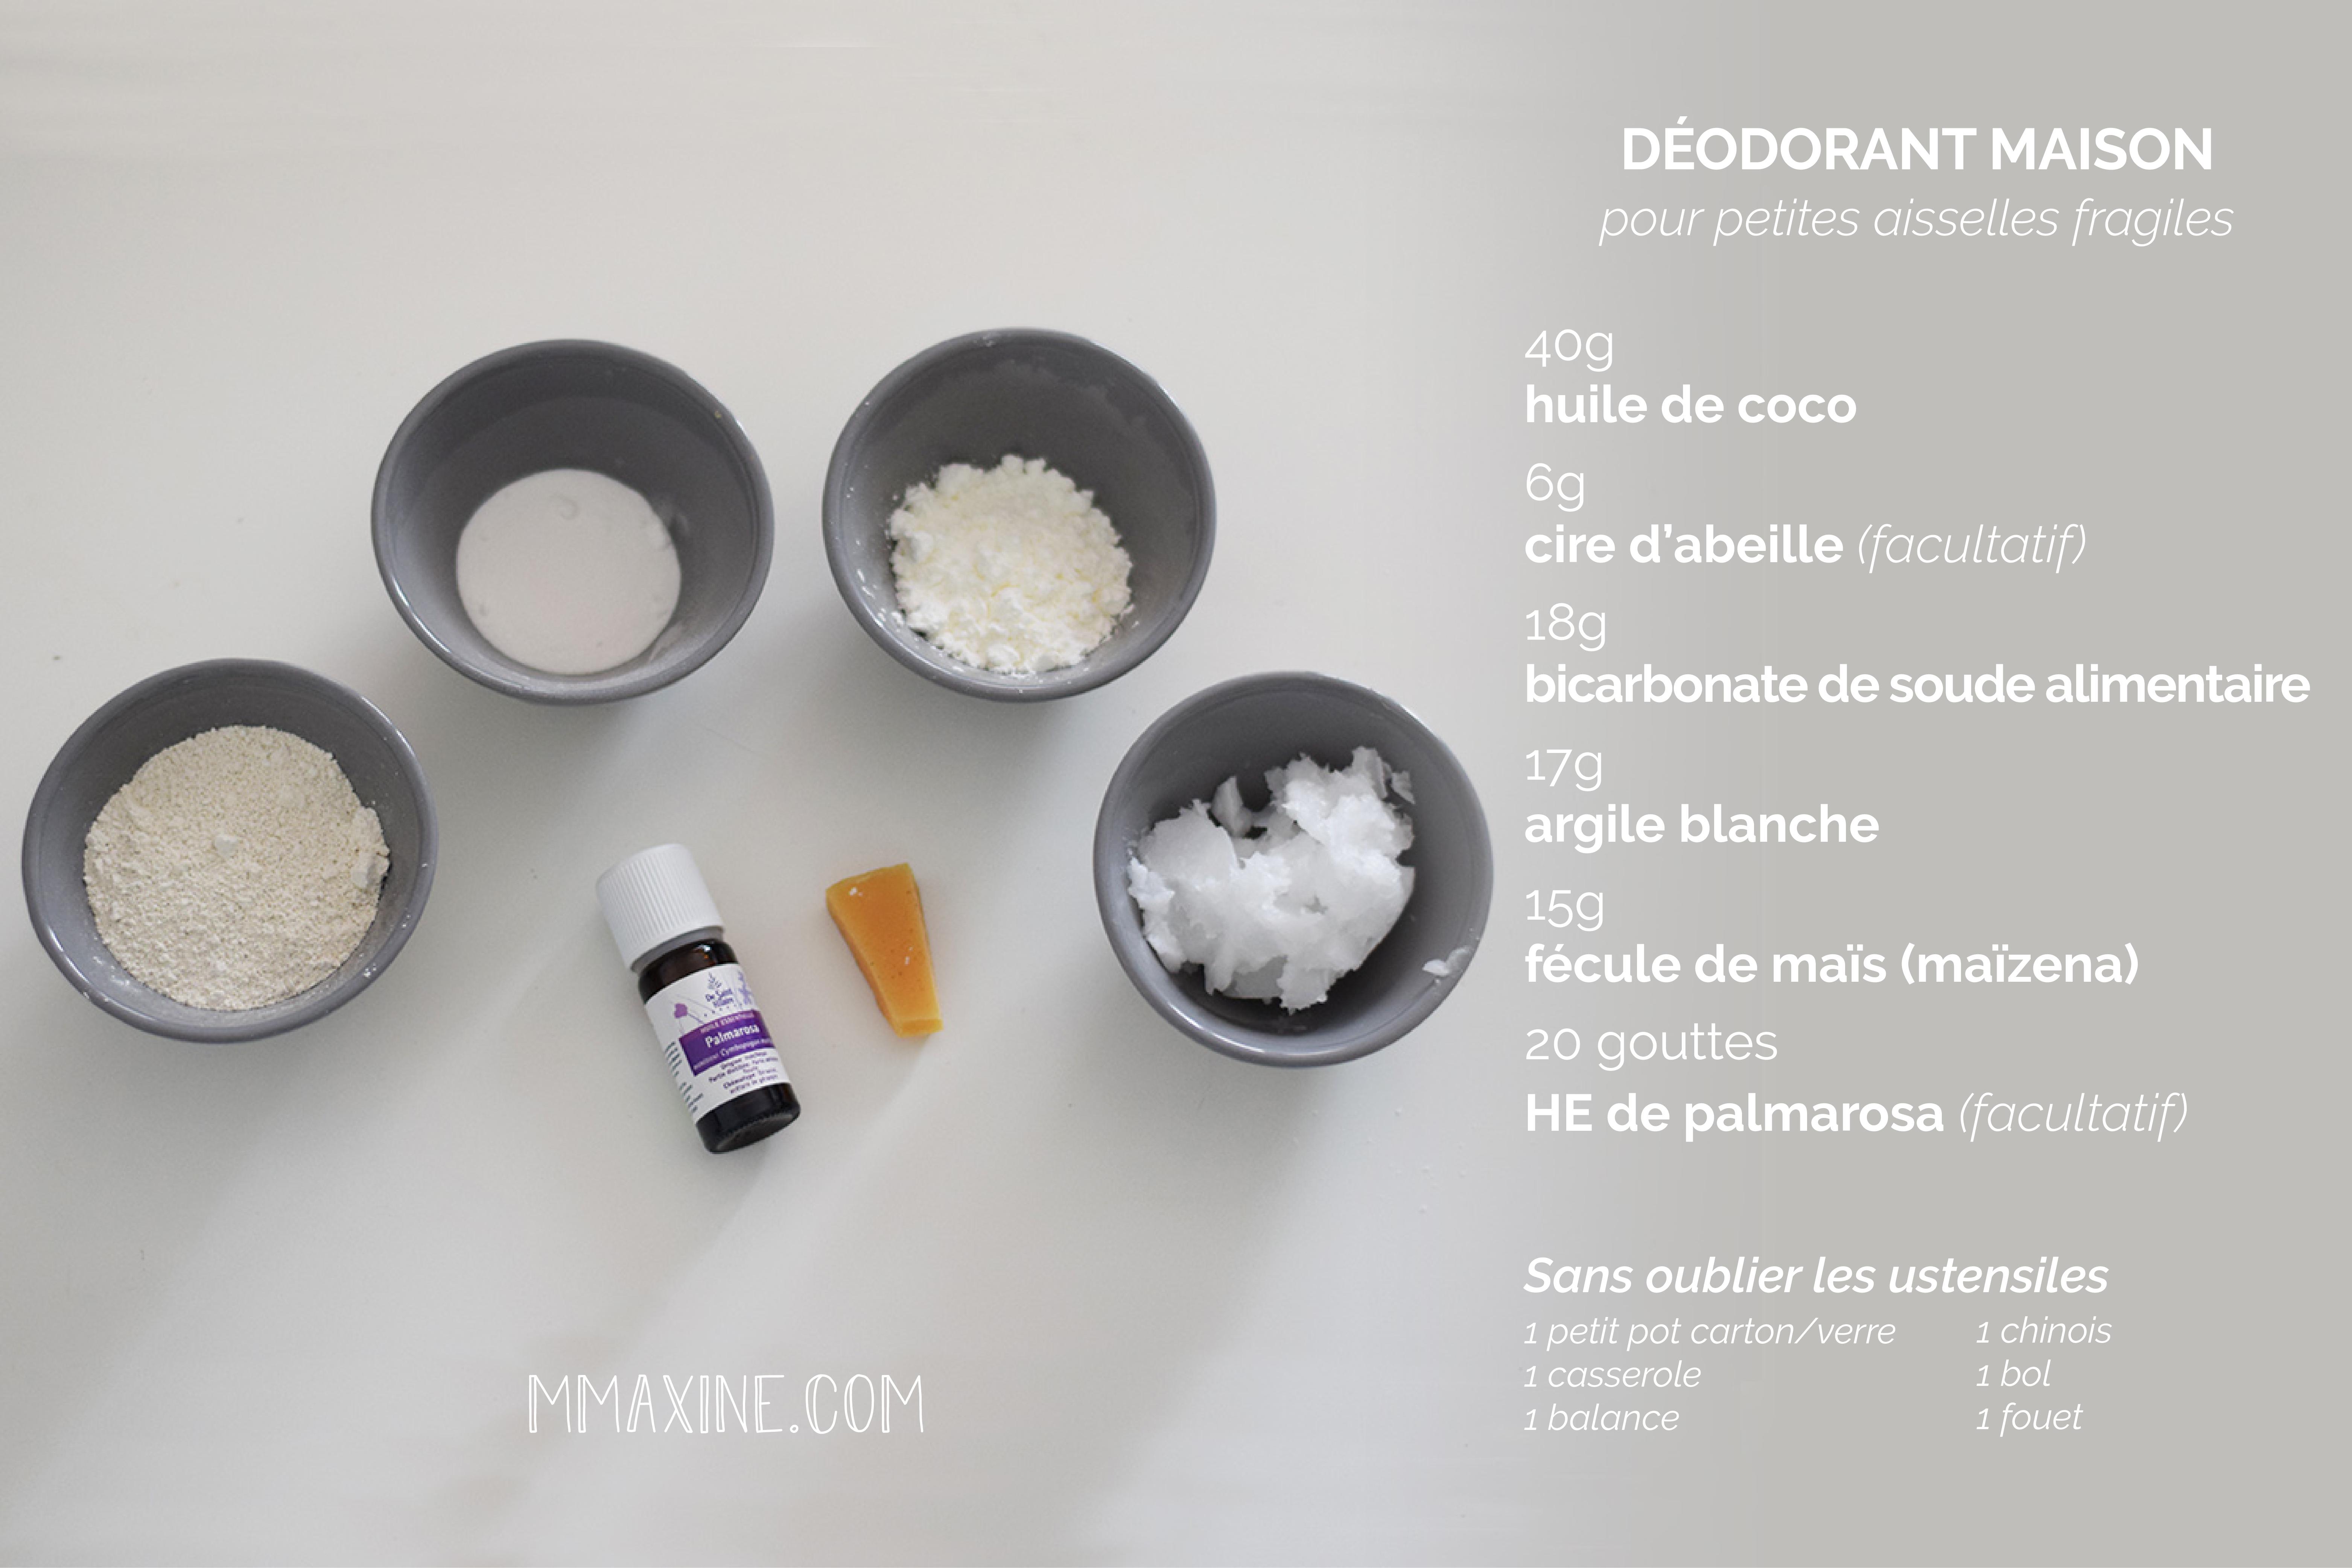 Mon déodorant maison – MMaxine ♥